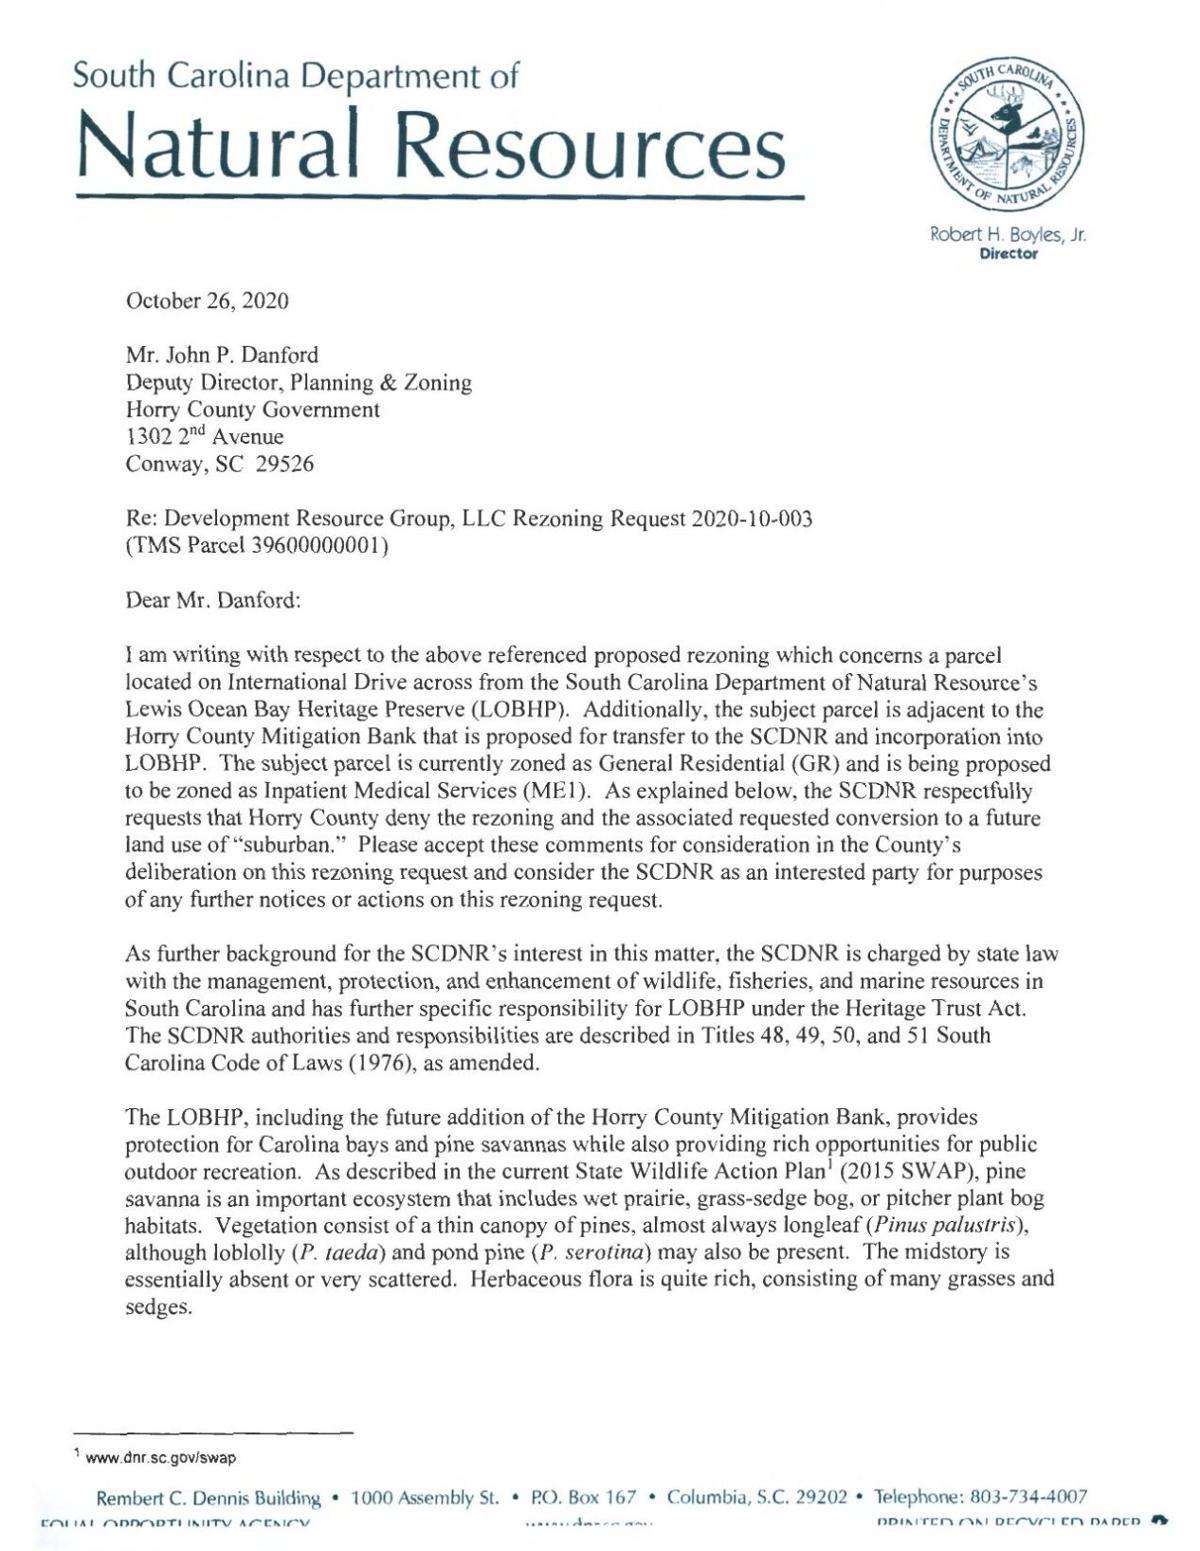 Hospital rezoning letter